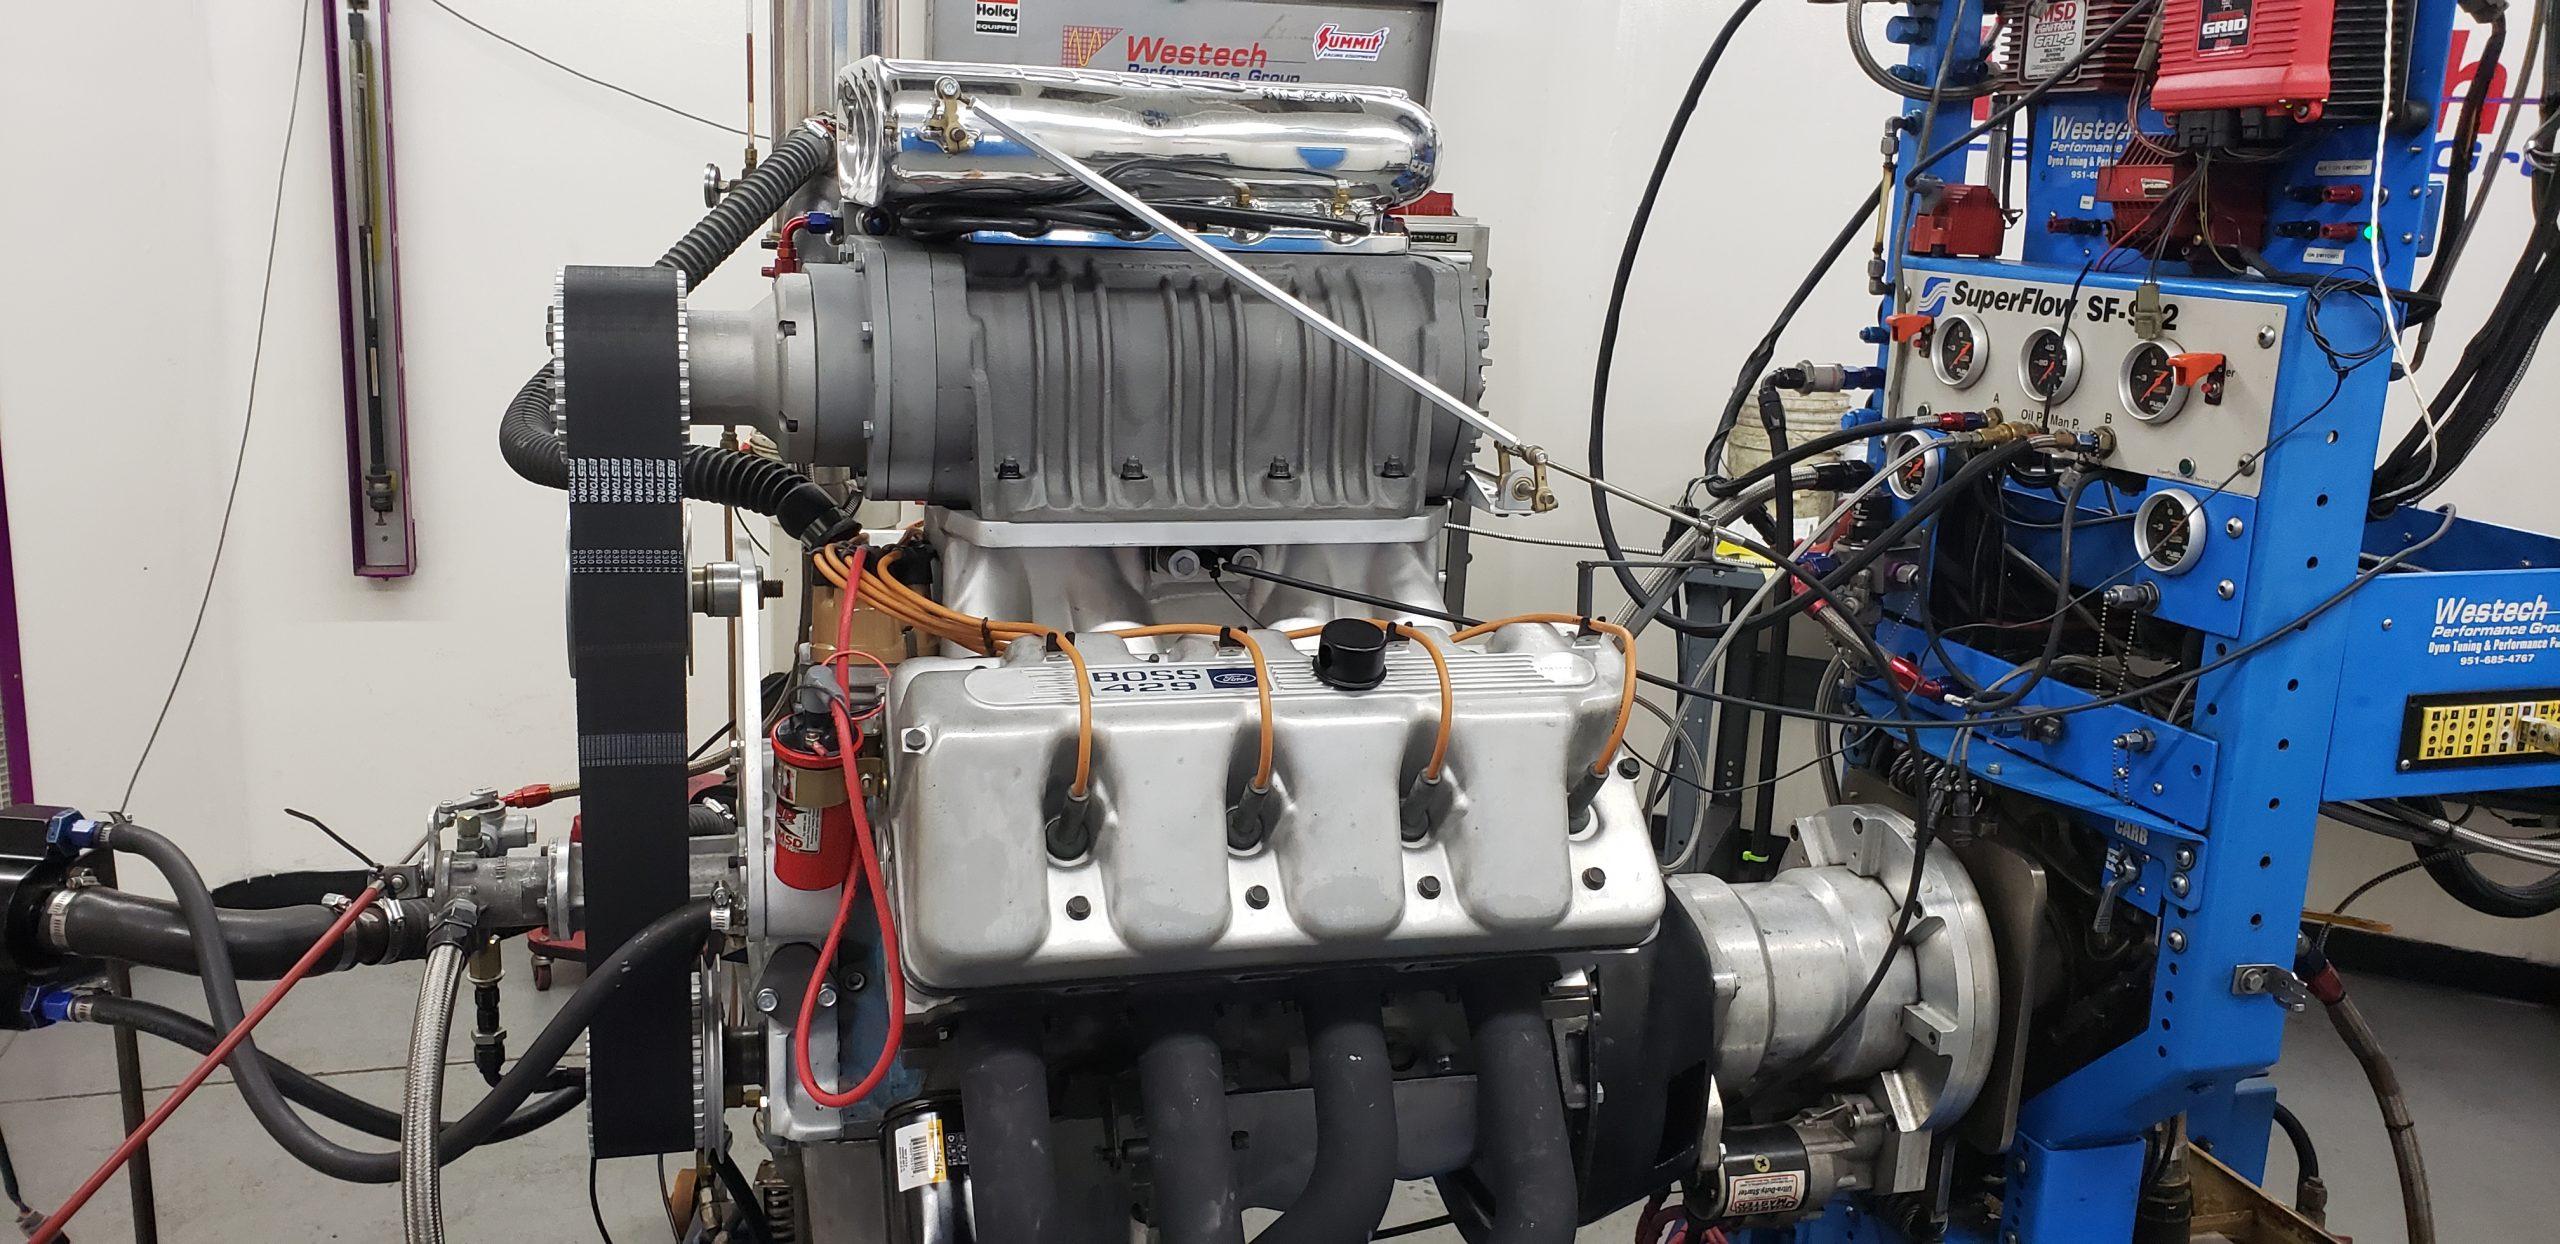 Lawman Boss 429 Ford Mustang restoration engine testing